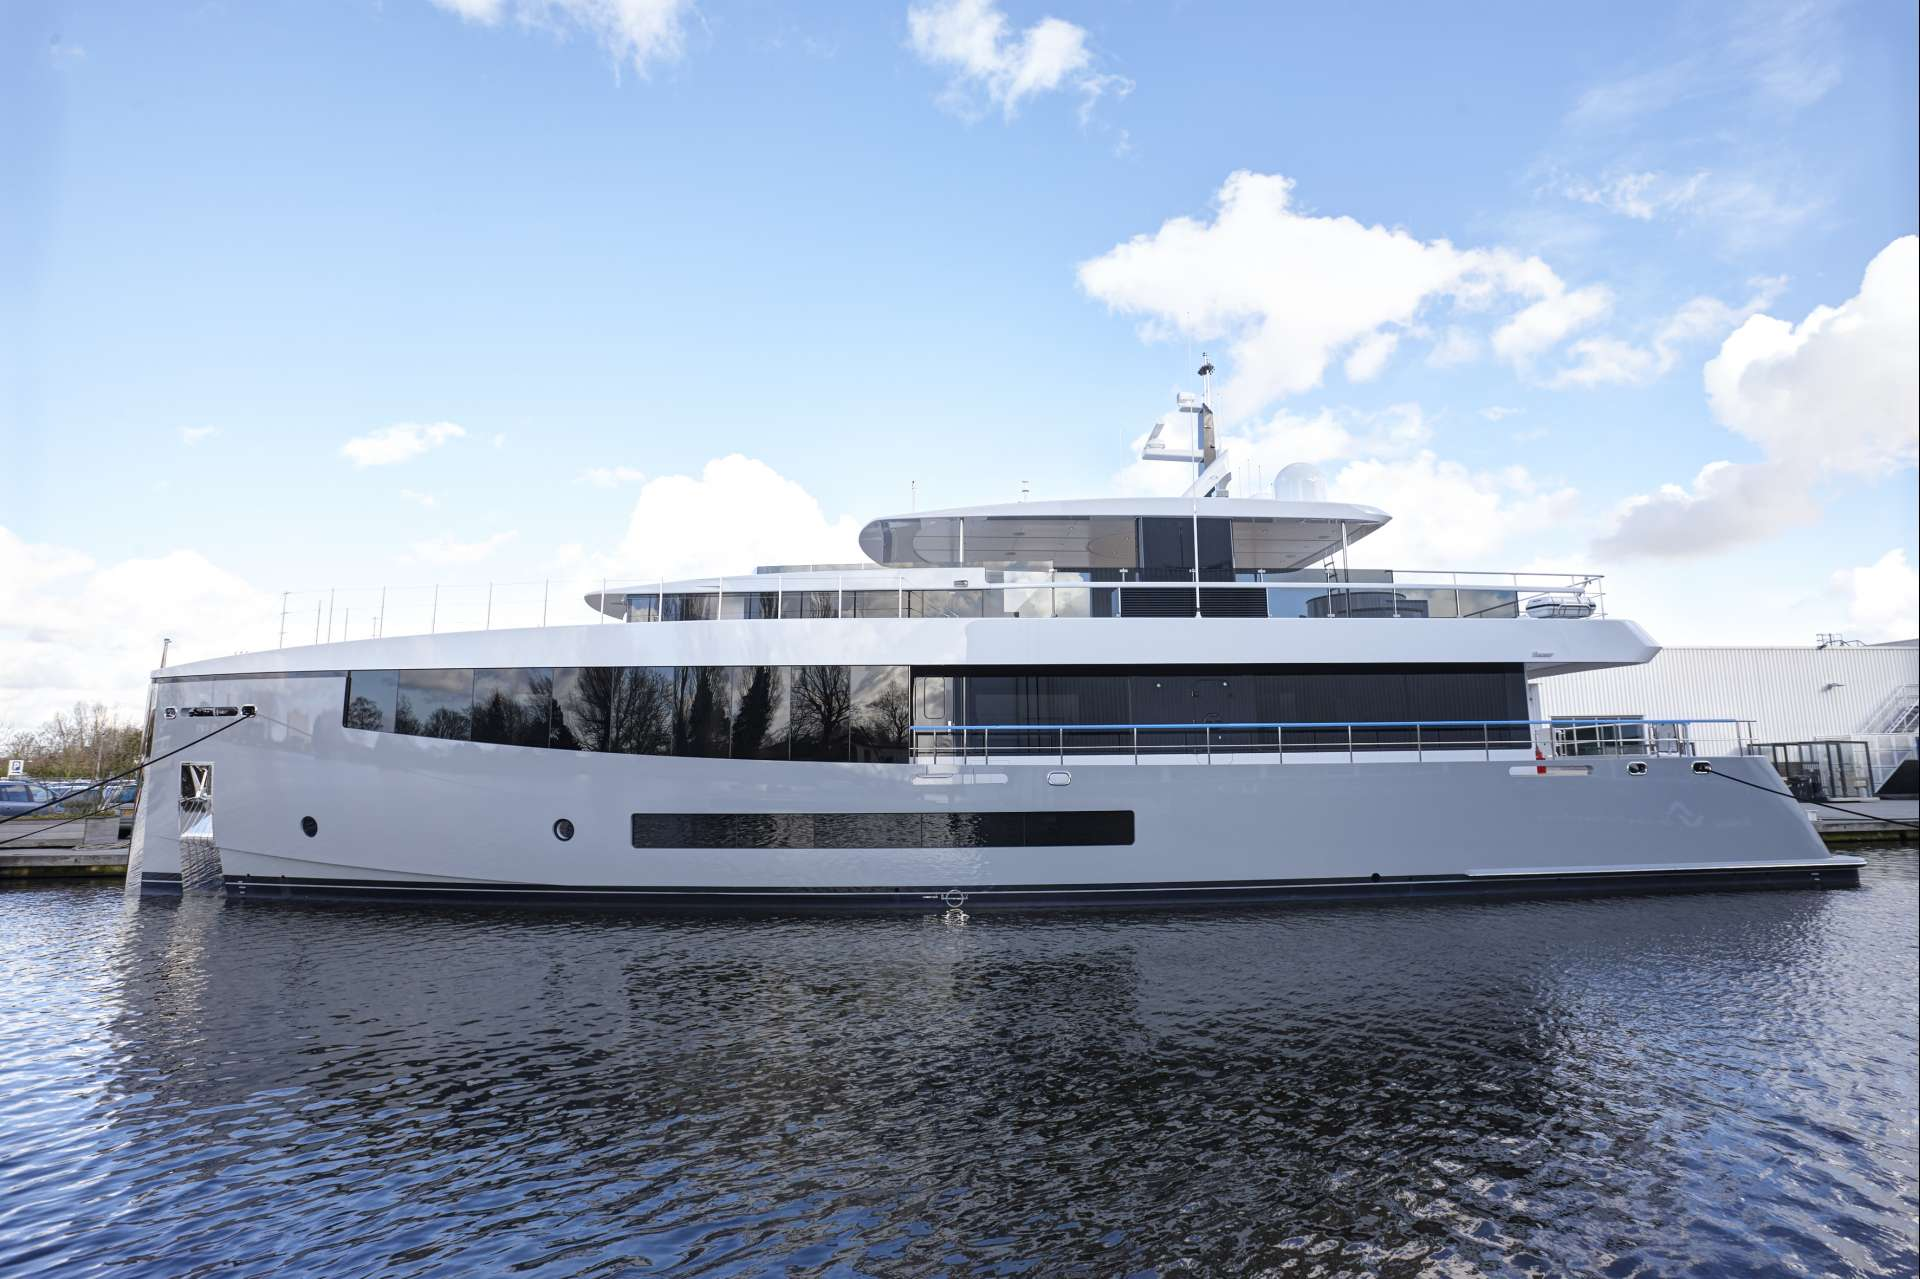 Avatar Feadship Royal Dutch Shipyards